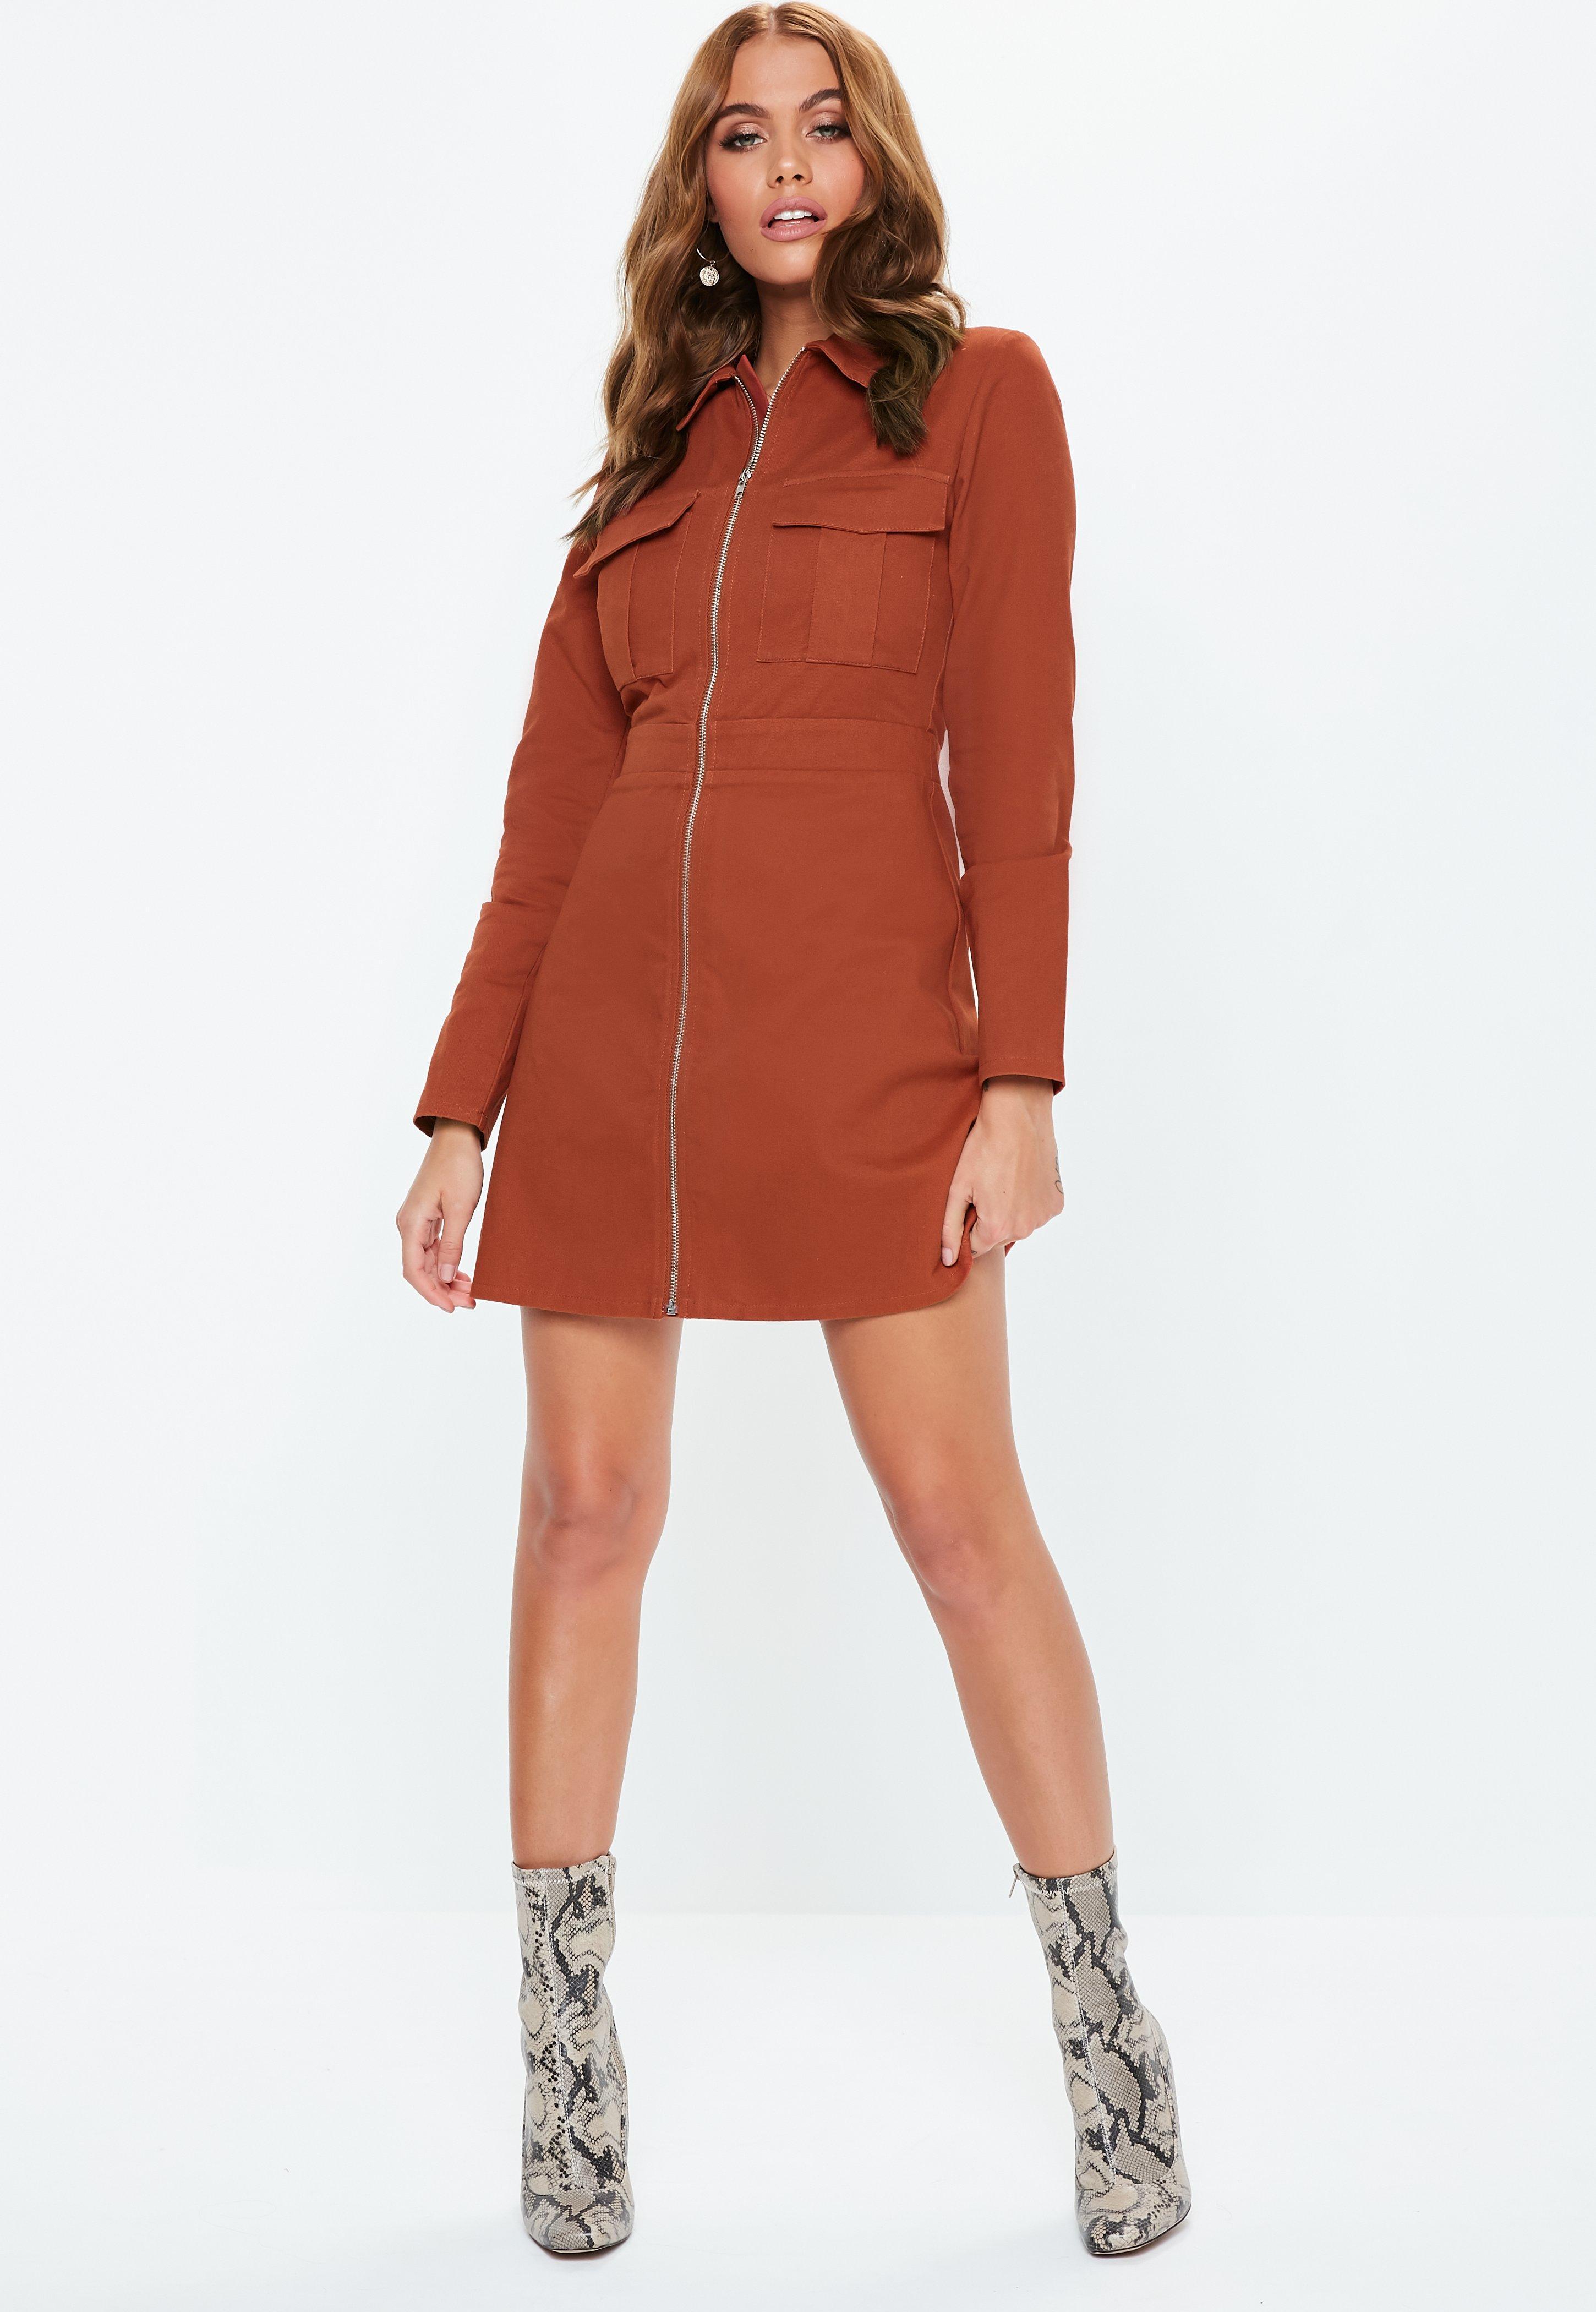 cdcb193454 Missguided - Multicolor Rust Zip Through Skater Shirt Dress - Lyst. View  fullscreen